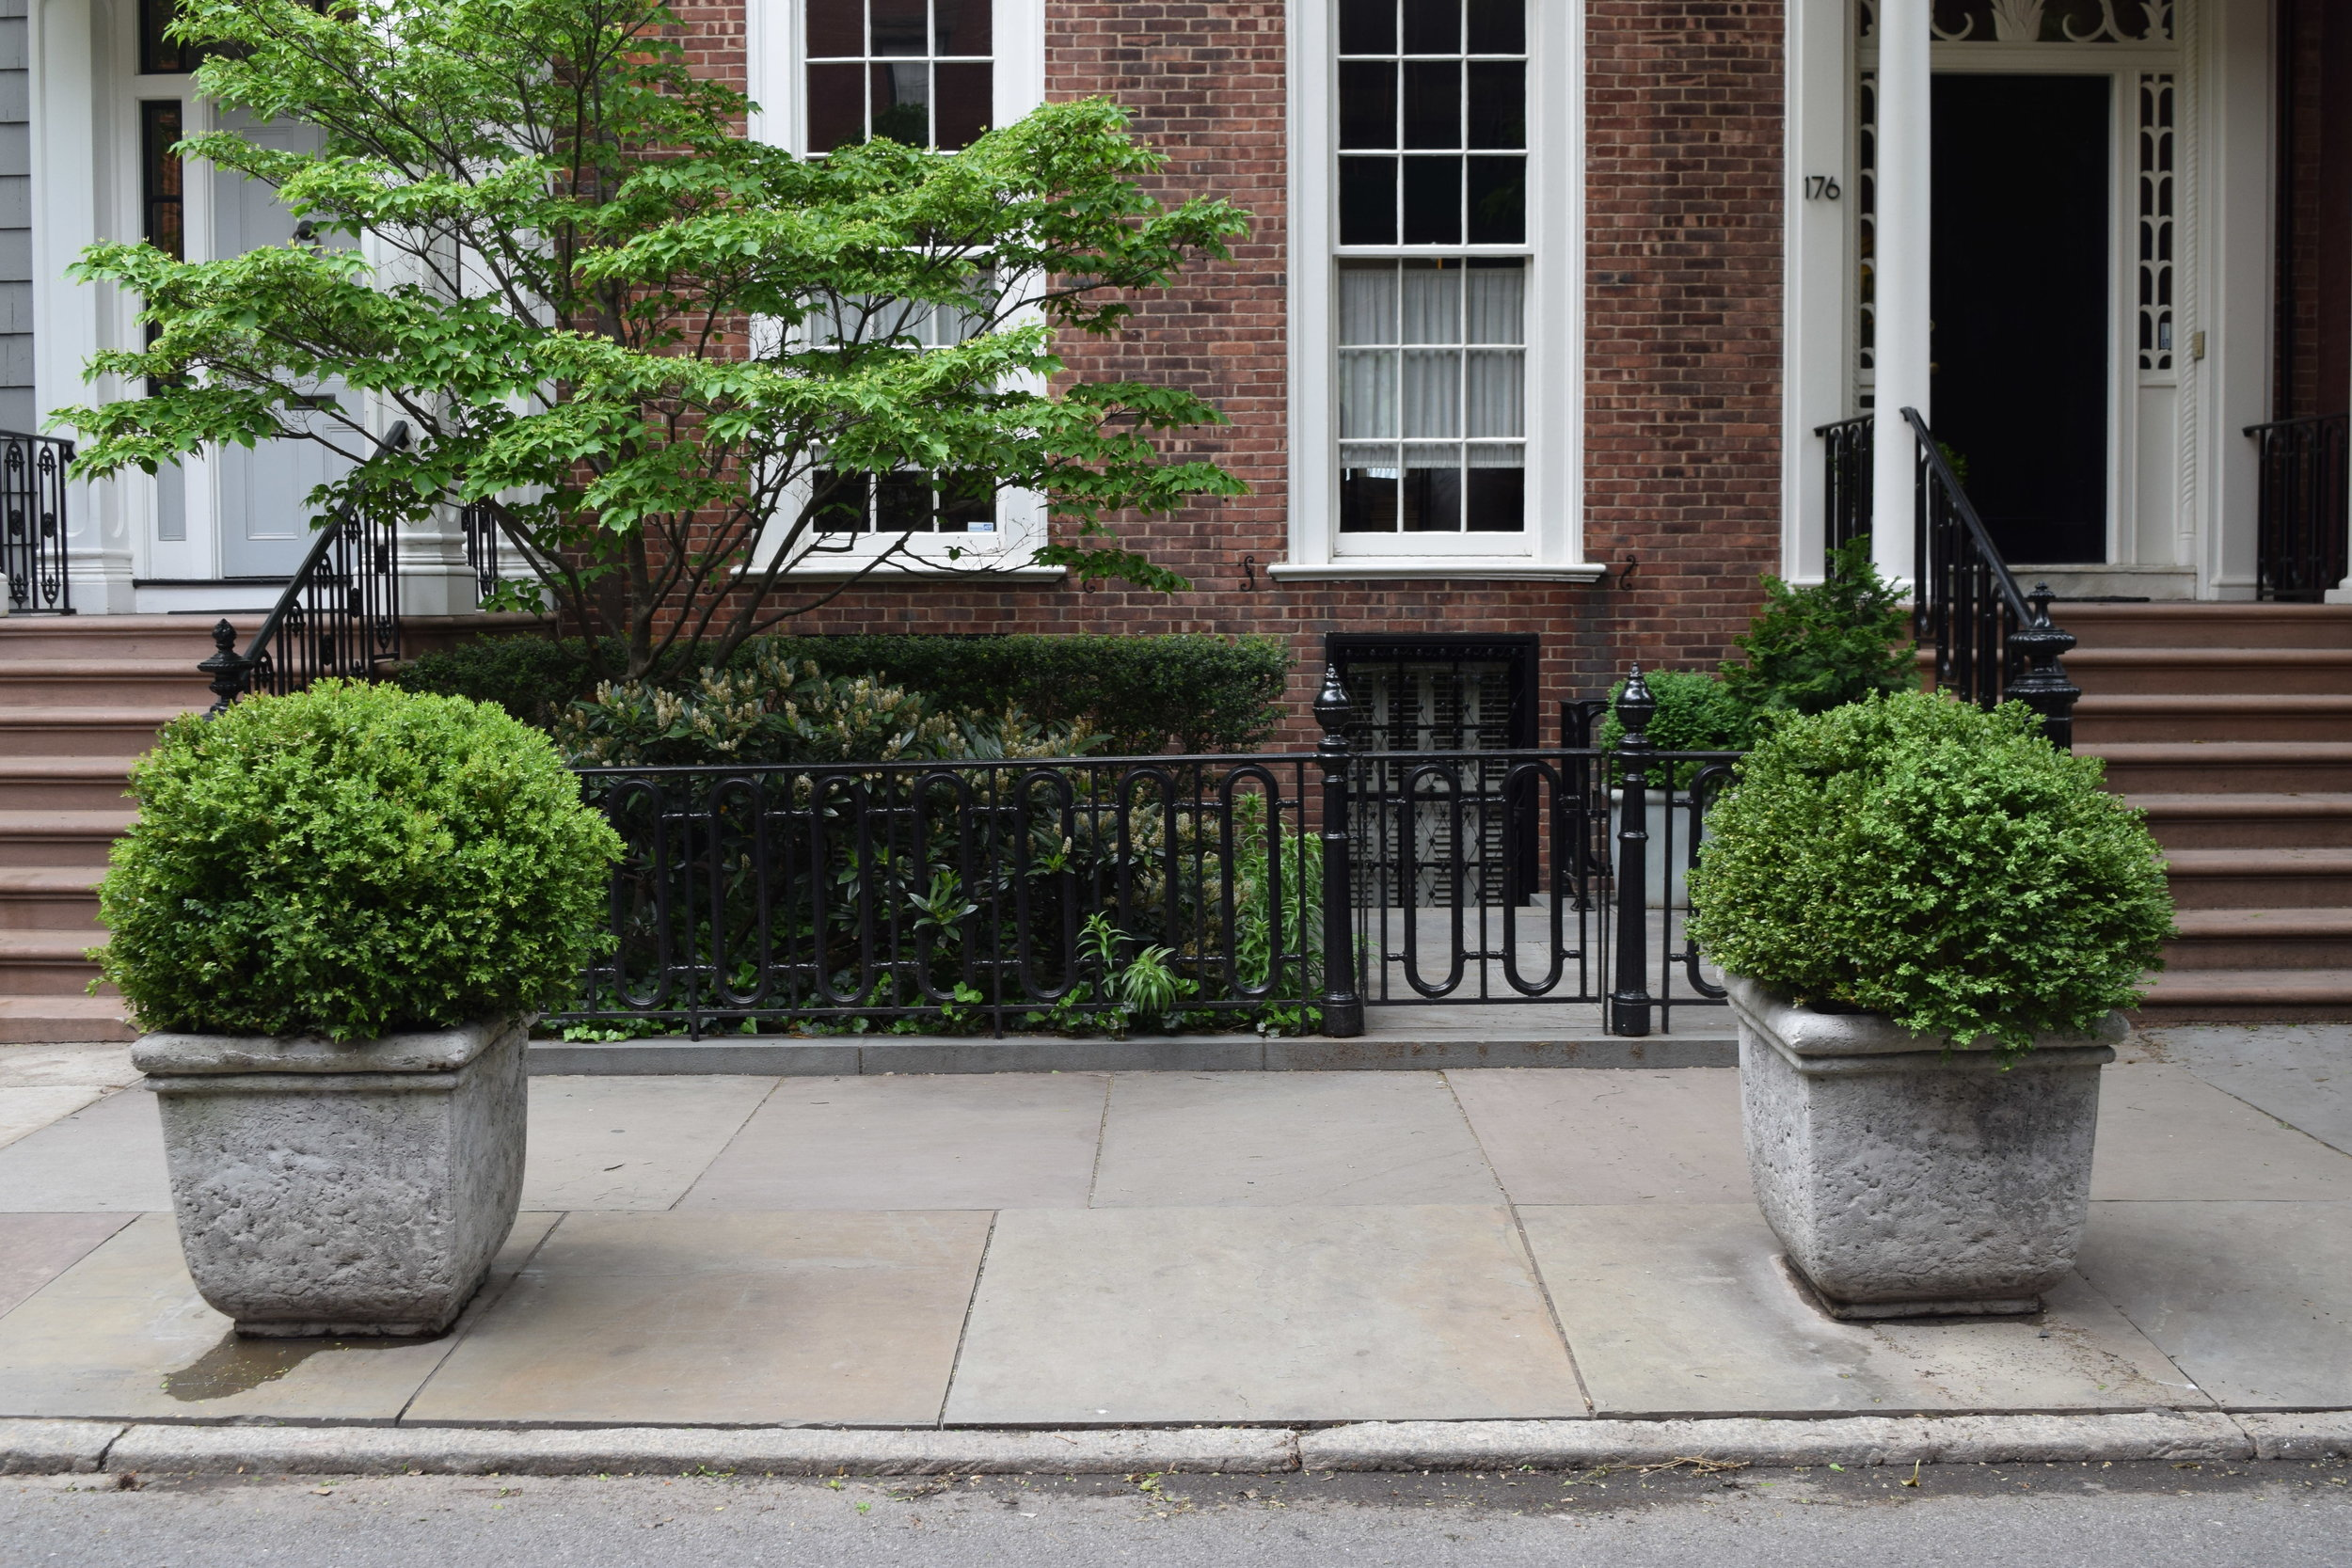 Brooklyn's Bluestone Sidewalk Provider